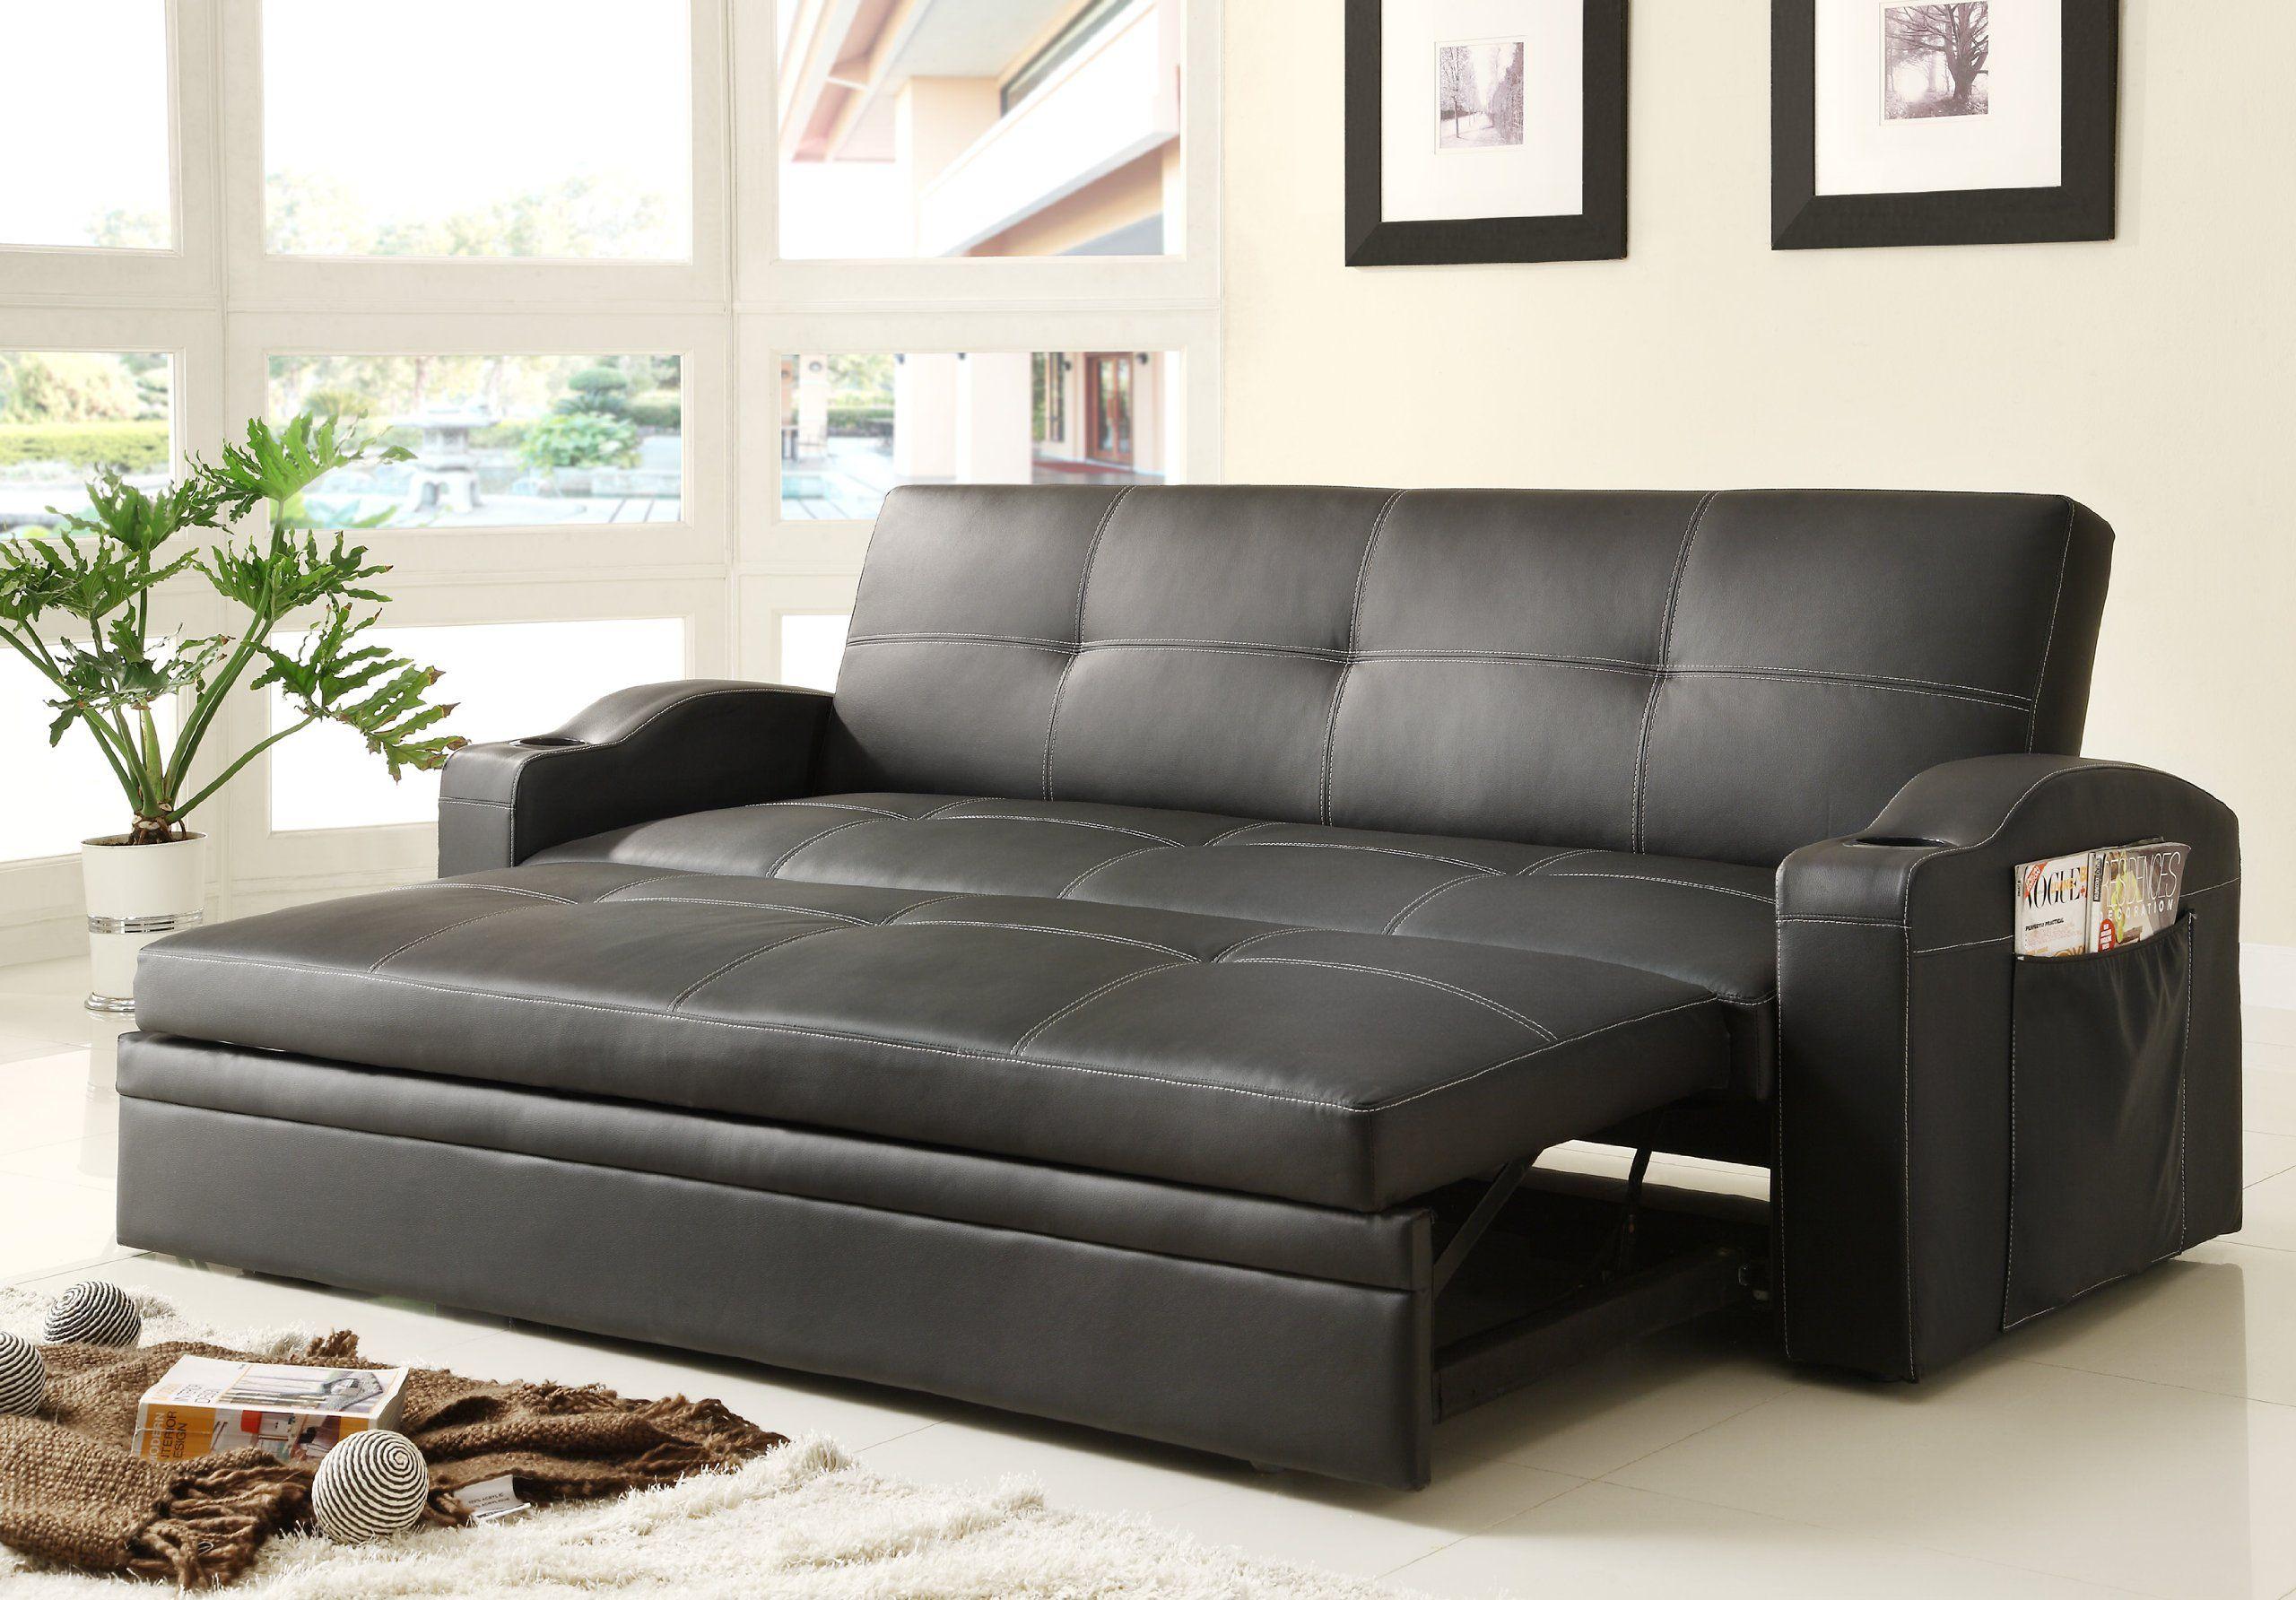 Amazon Com Homelegance 4803blk Convertible Adjustable Sofa Bed Black Bi Cast Vinyl Sleeper So Leather Sofa